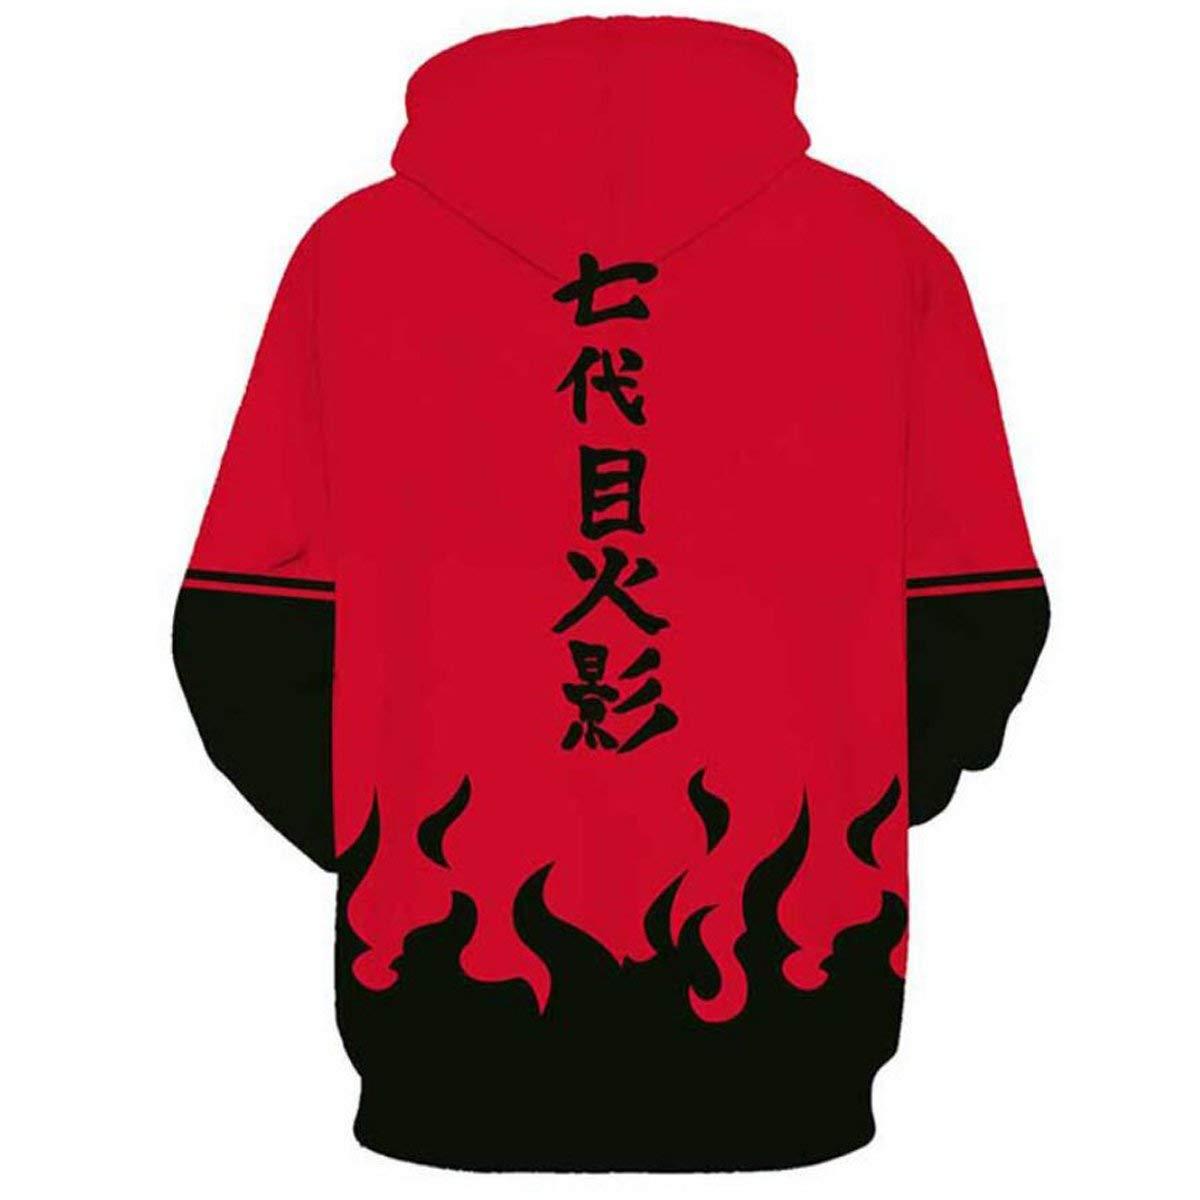 Nsoking Japanese Anime Naruto Cosplay Costume 3D Printed Uchiha Hoodie